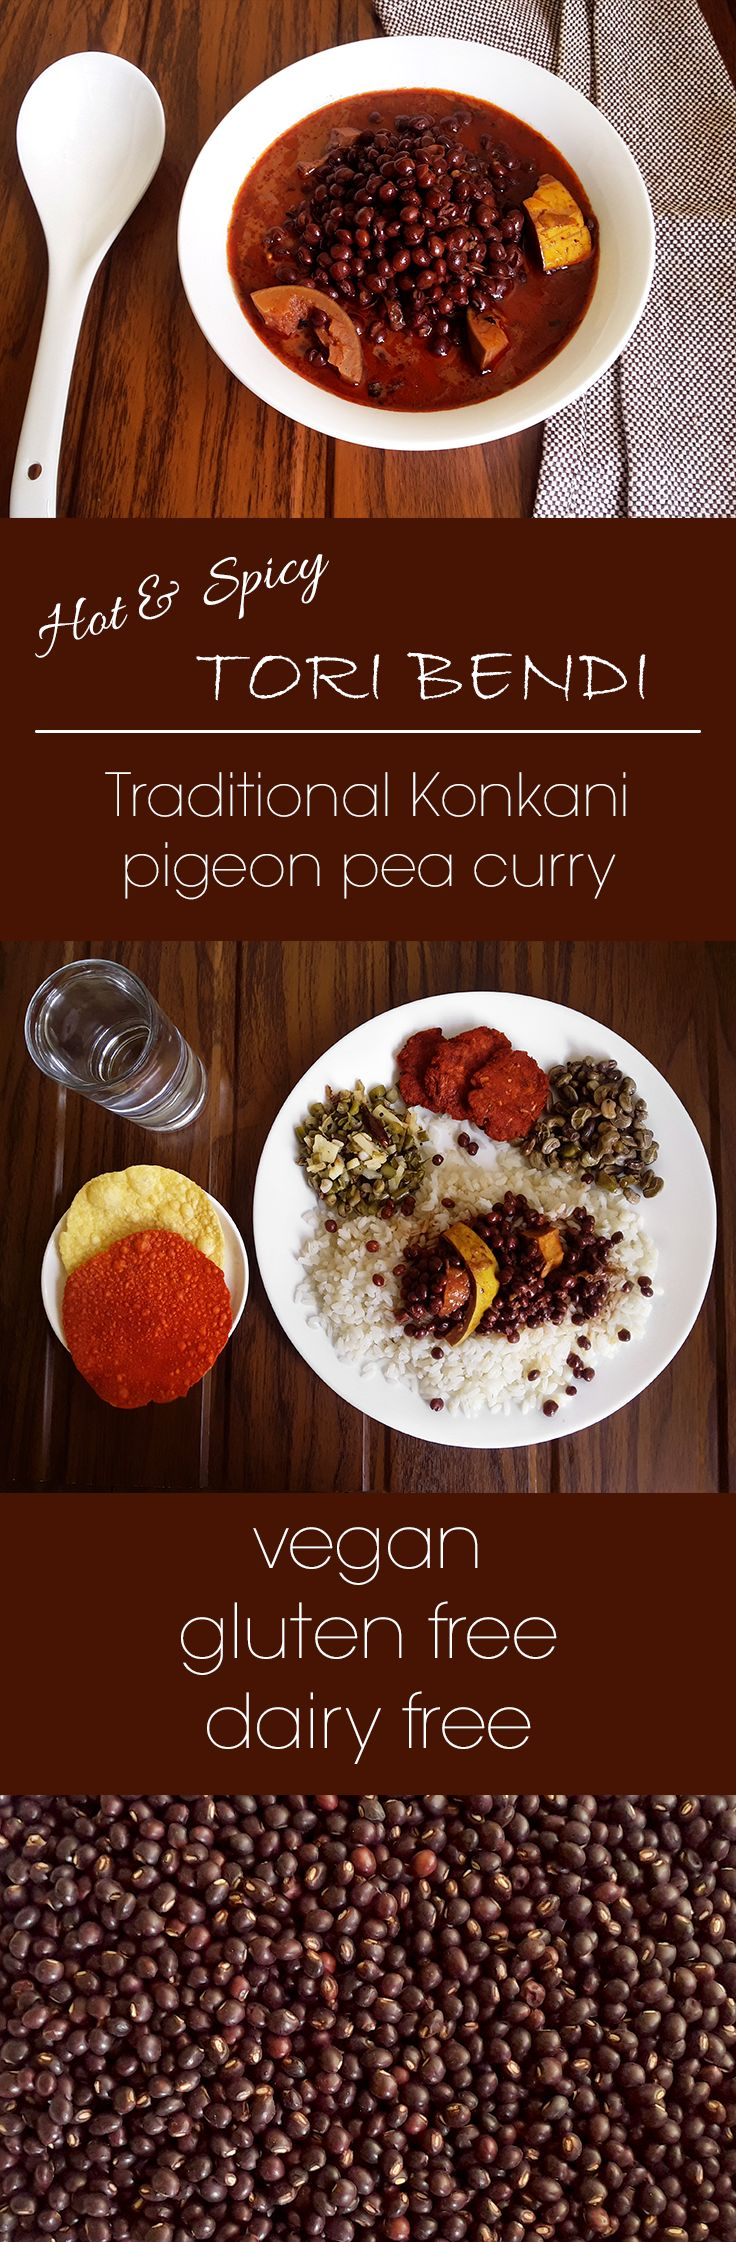 Tori Bendi - Pigeon pea chili curry - Pinterest